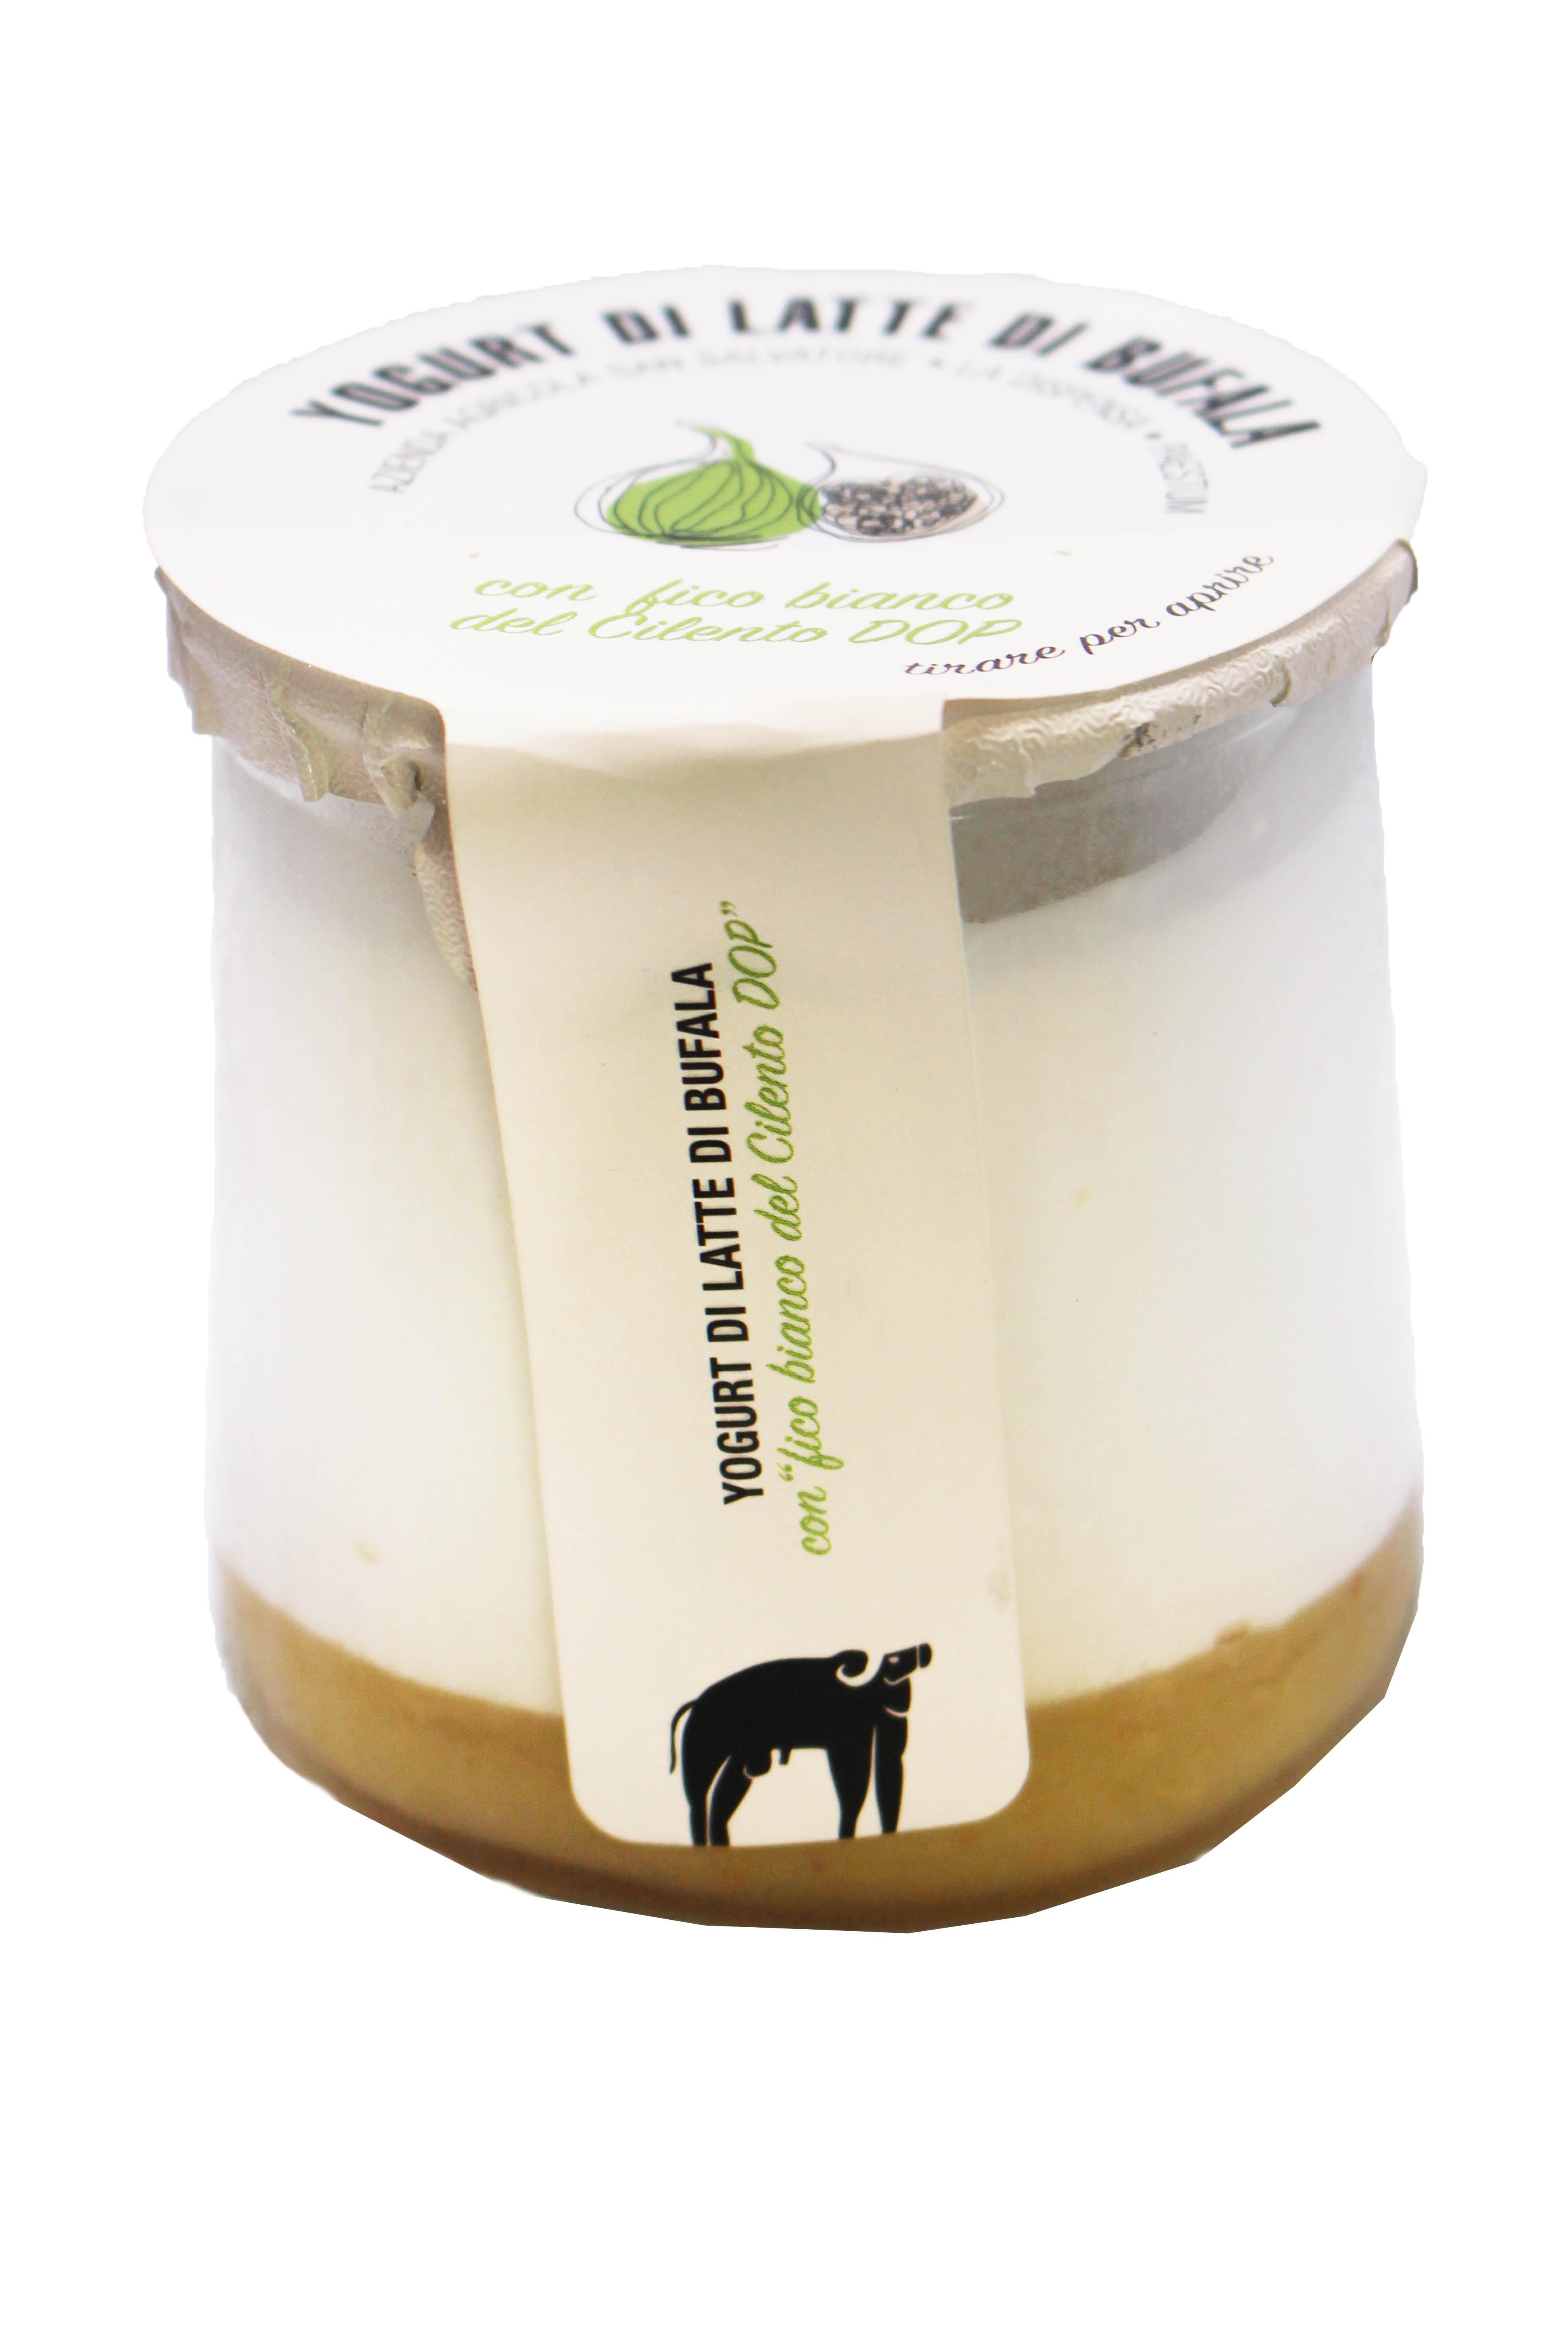 Yogurt di latte di bufala -  fico bianco del cilento DOP 150gr